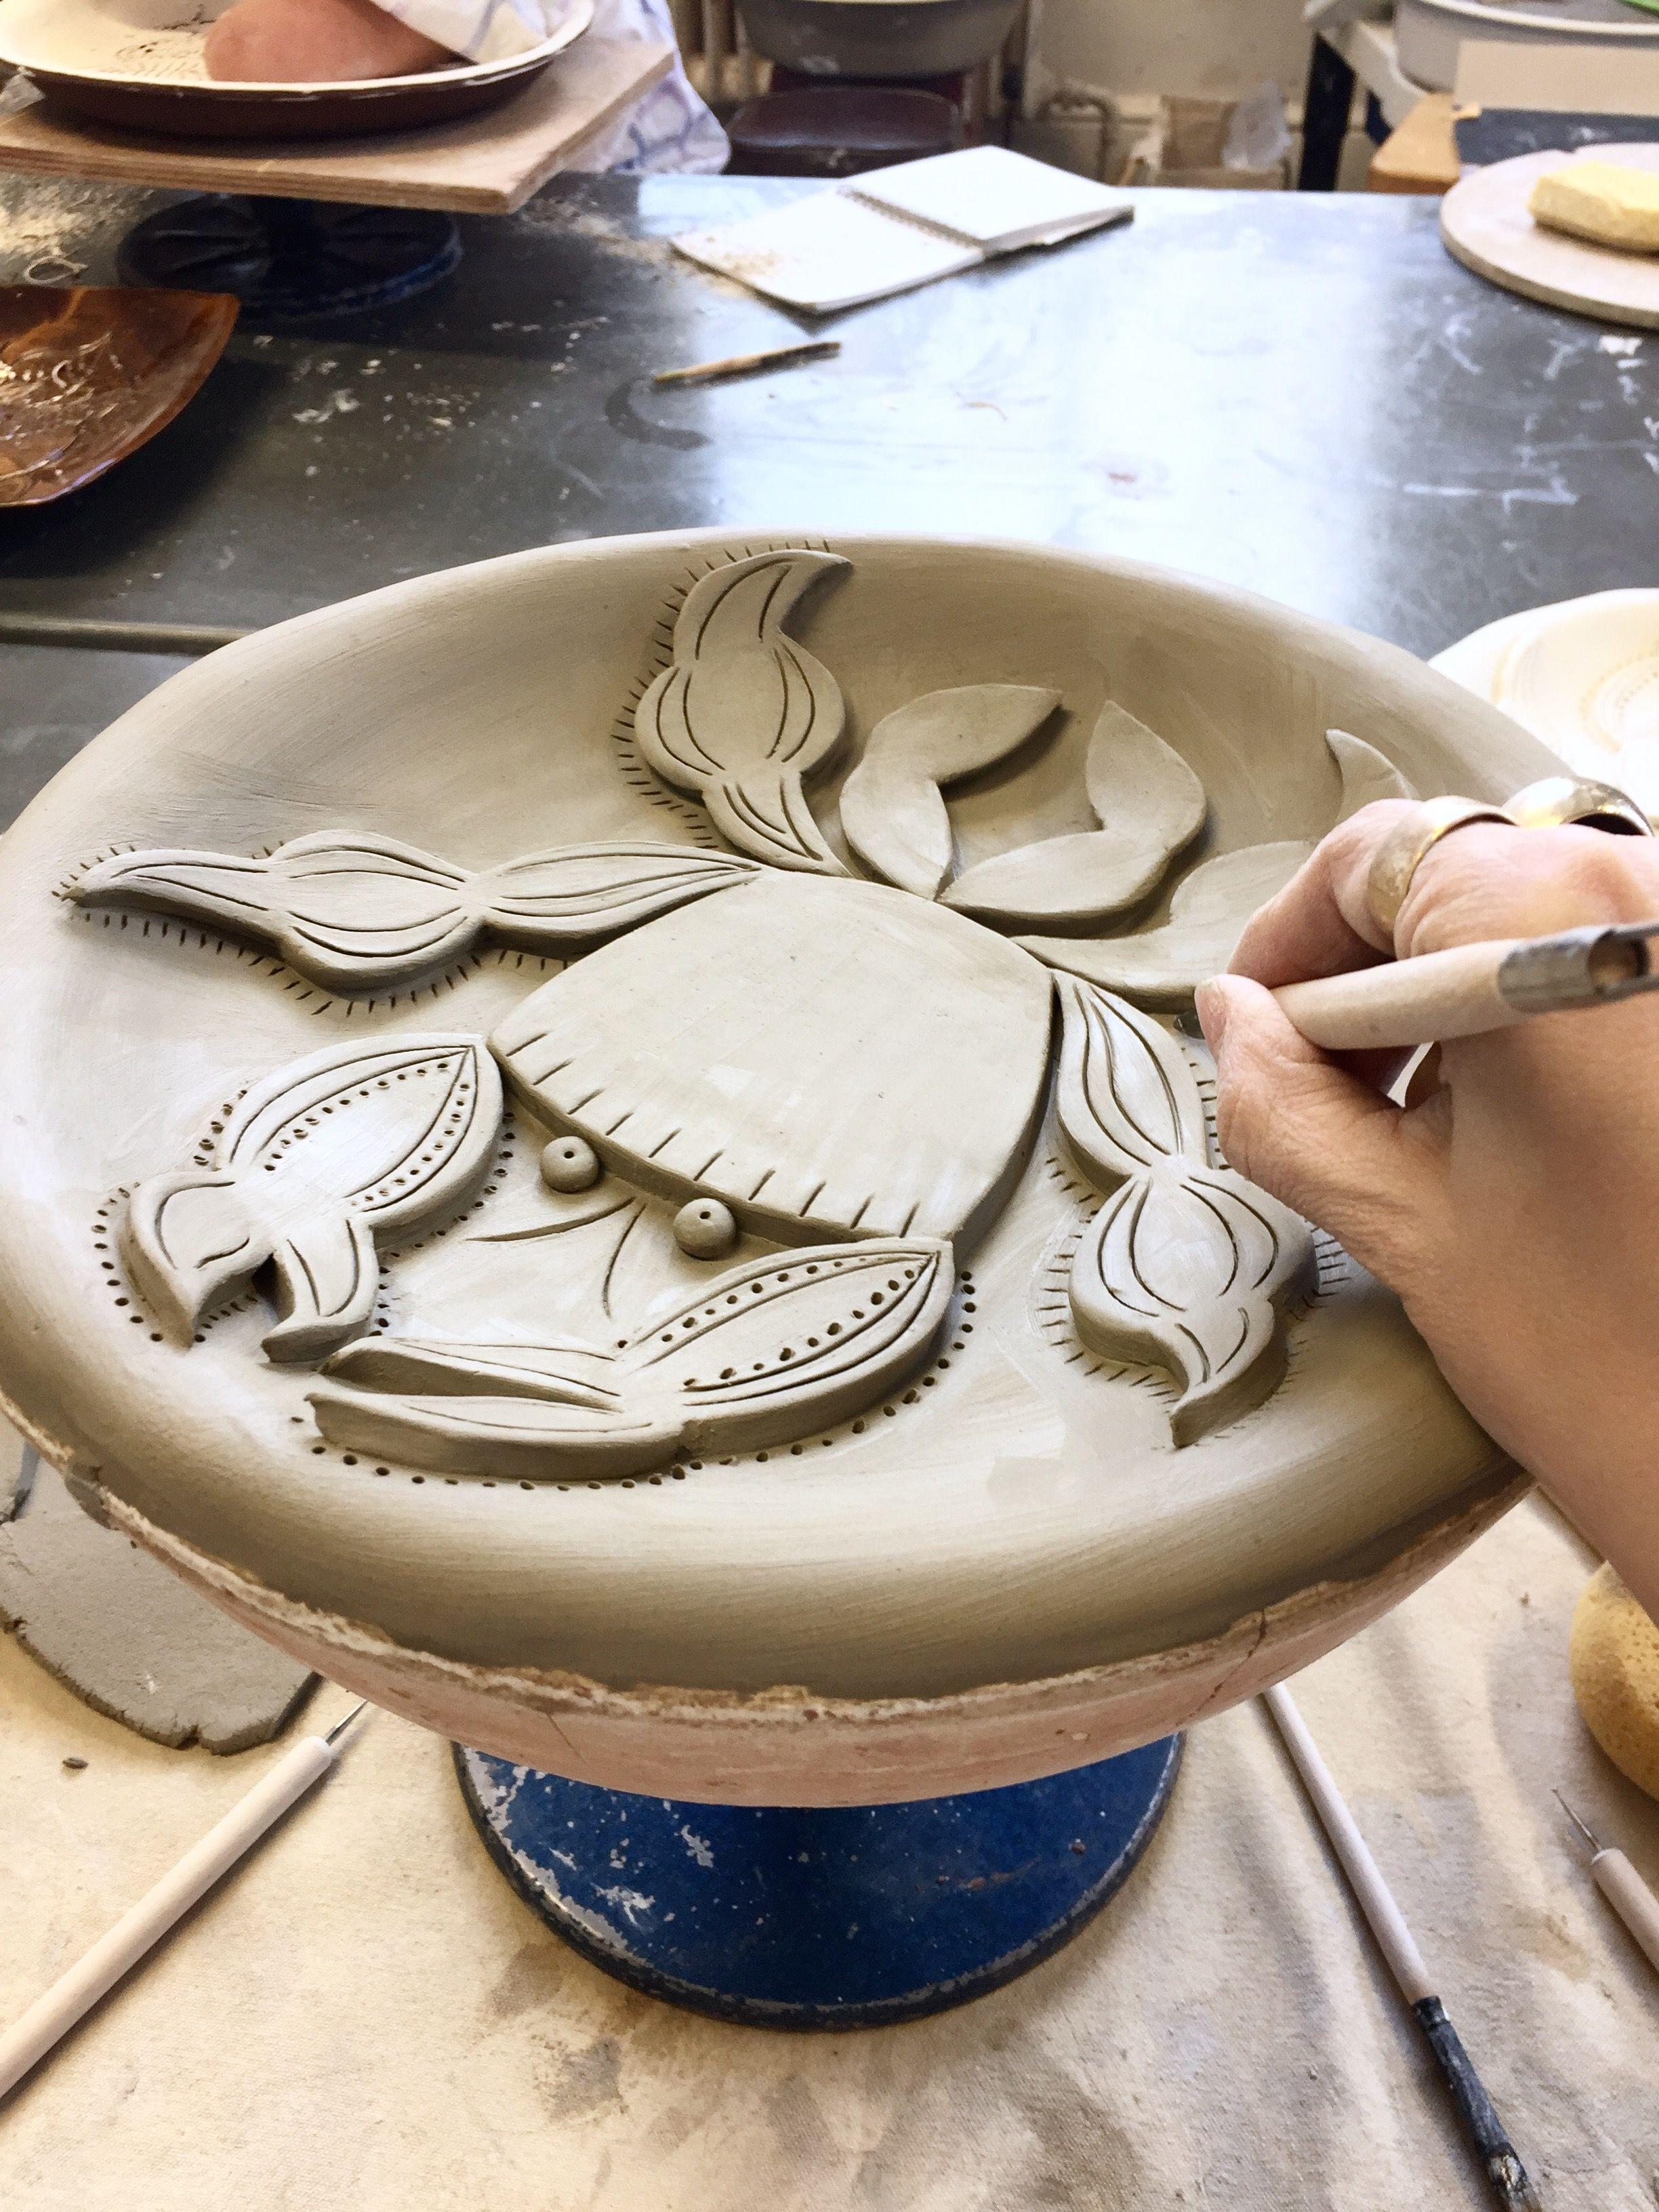 Mr Milly\u0027s making a ceramic crab plate & Mr Milly\u0027s making a ceramic crab plate | Ceramics - Slab Building ...